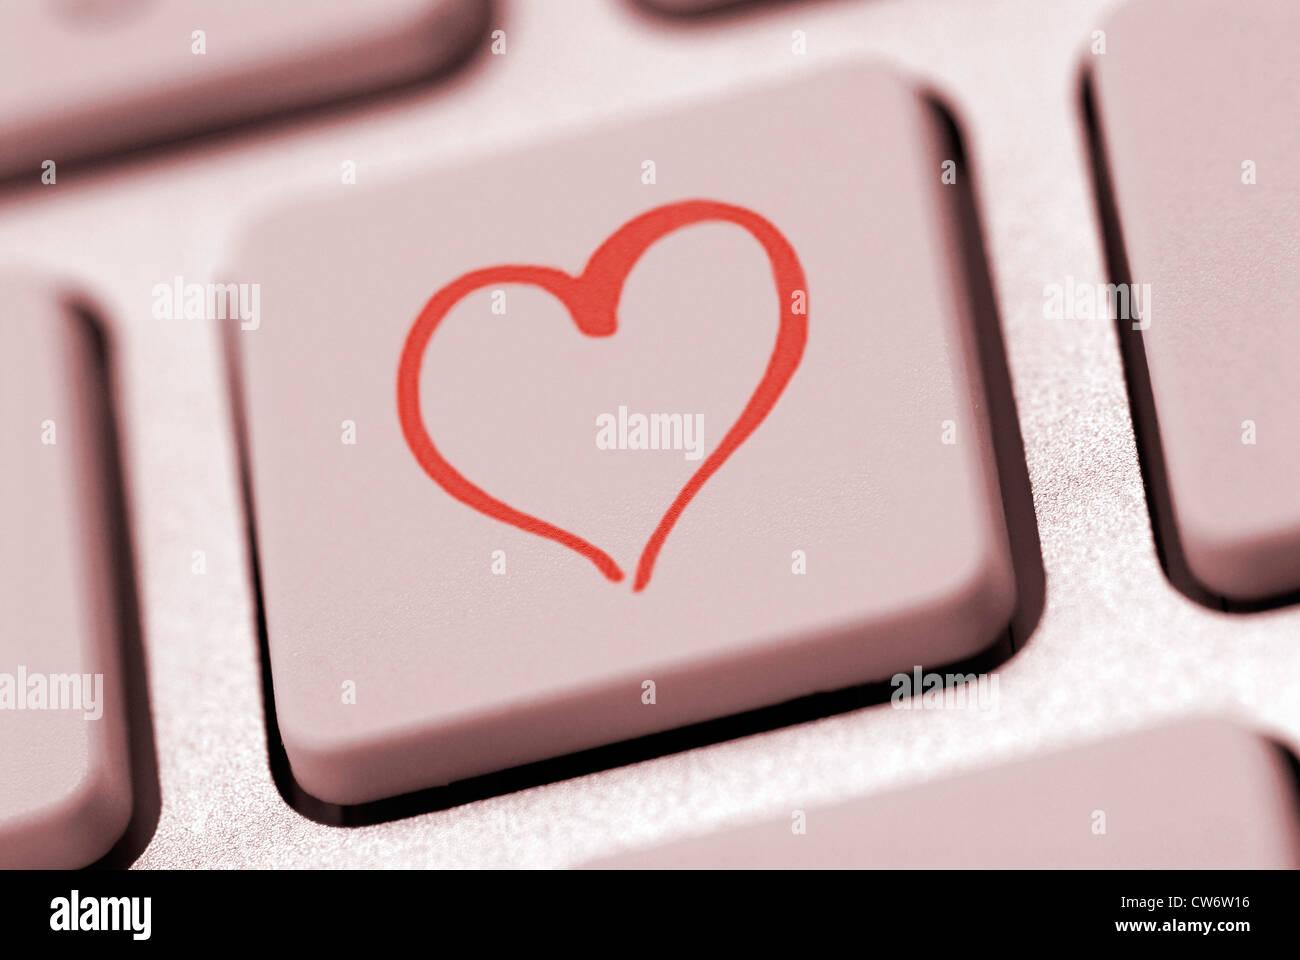 Heart Symbol On A Computer Key Stock Photo 49938482 Alamy